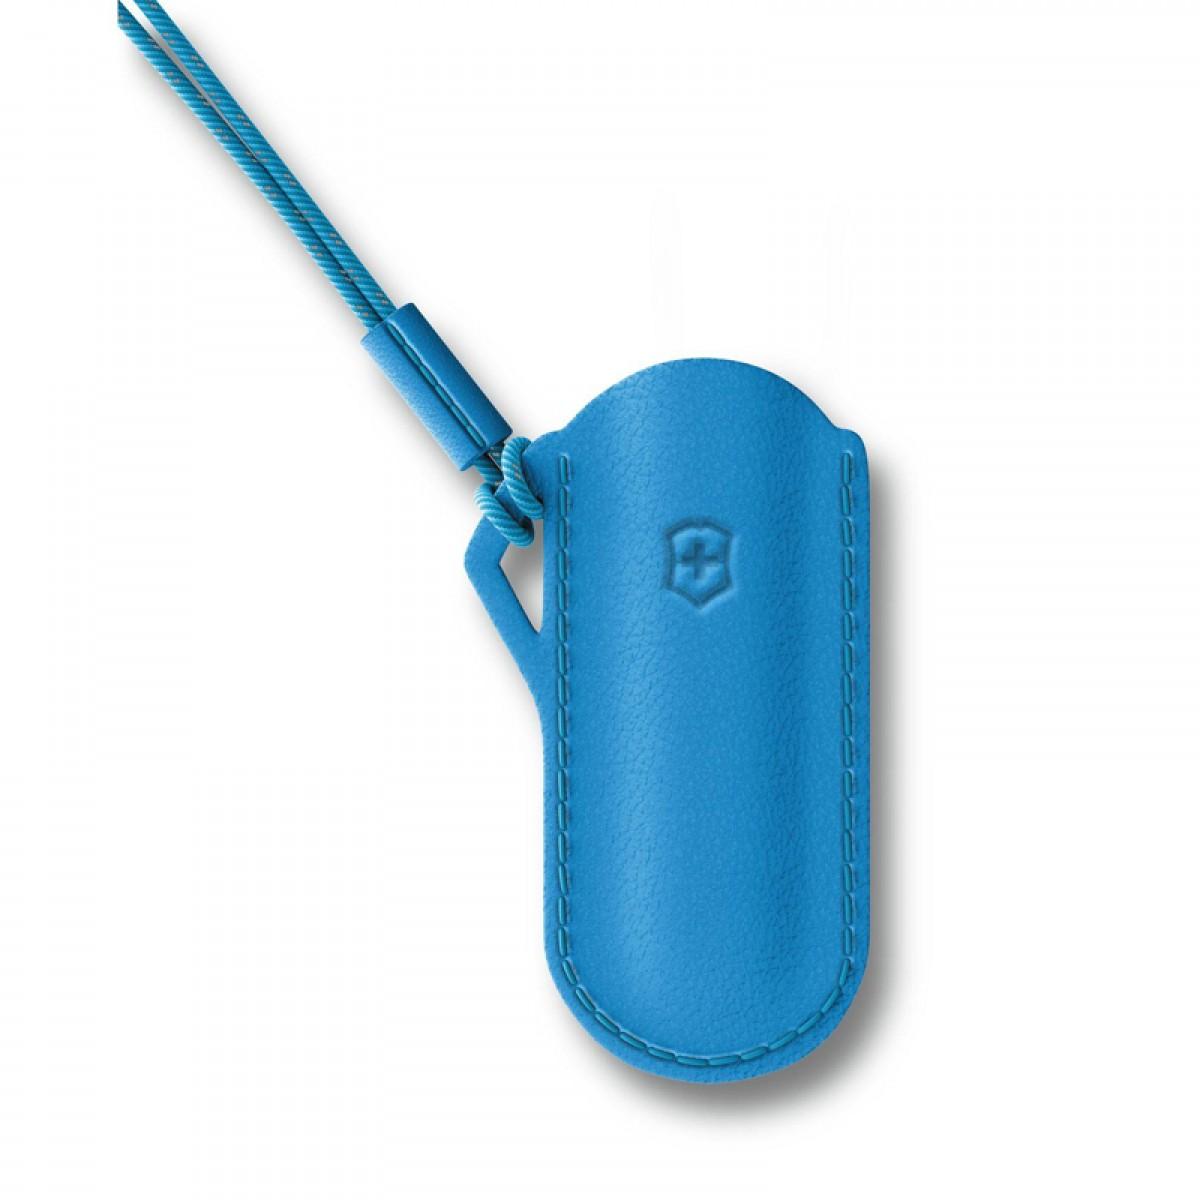 Victorinox Leather Pouch Classic Colors Summer Rain Light Blue 58mm 4.0670.2